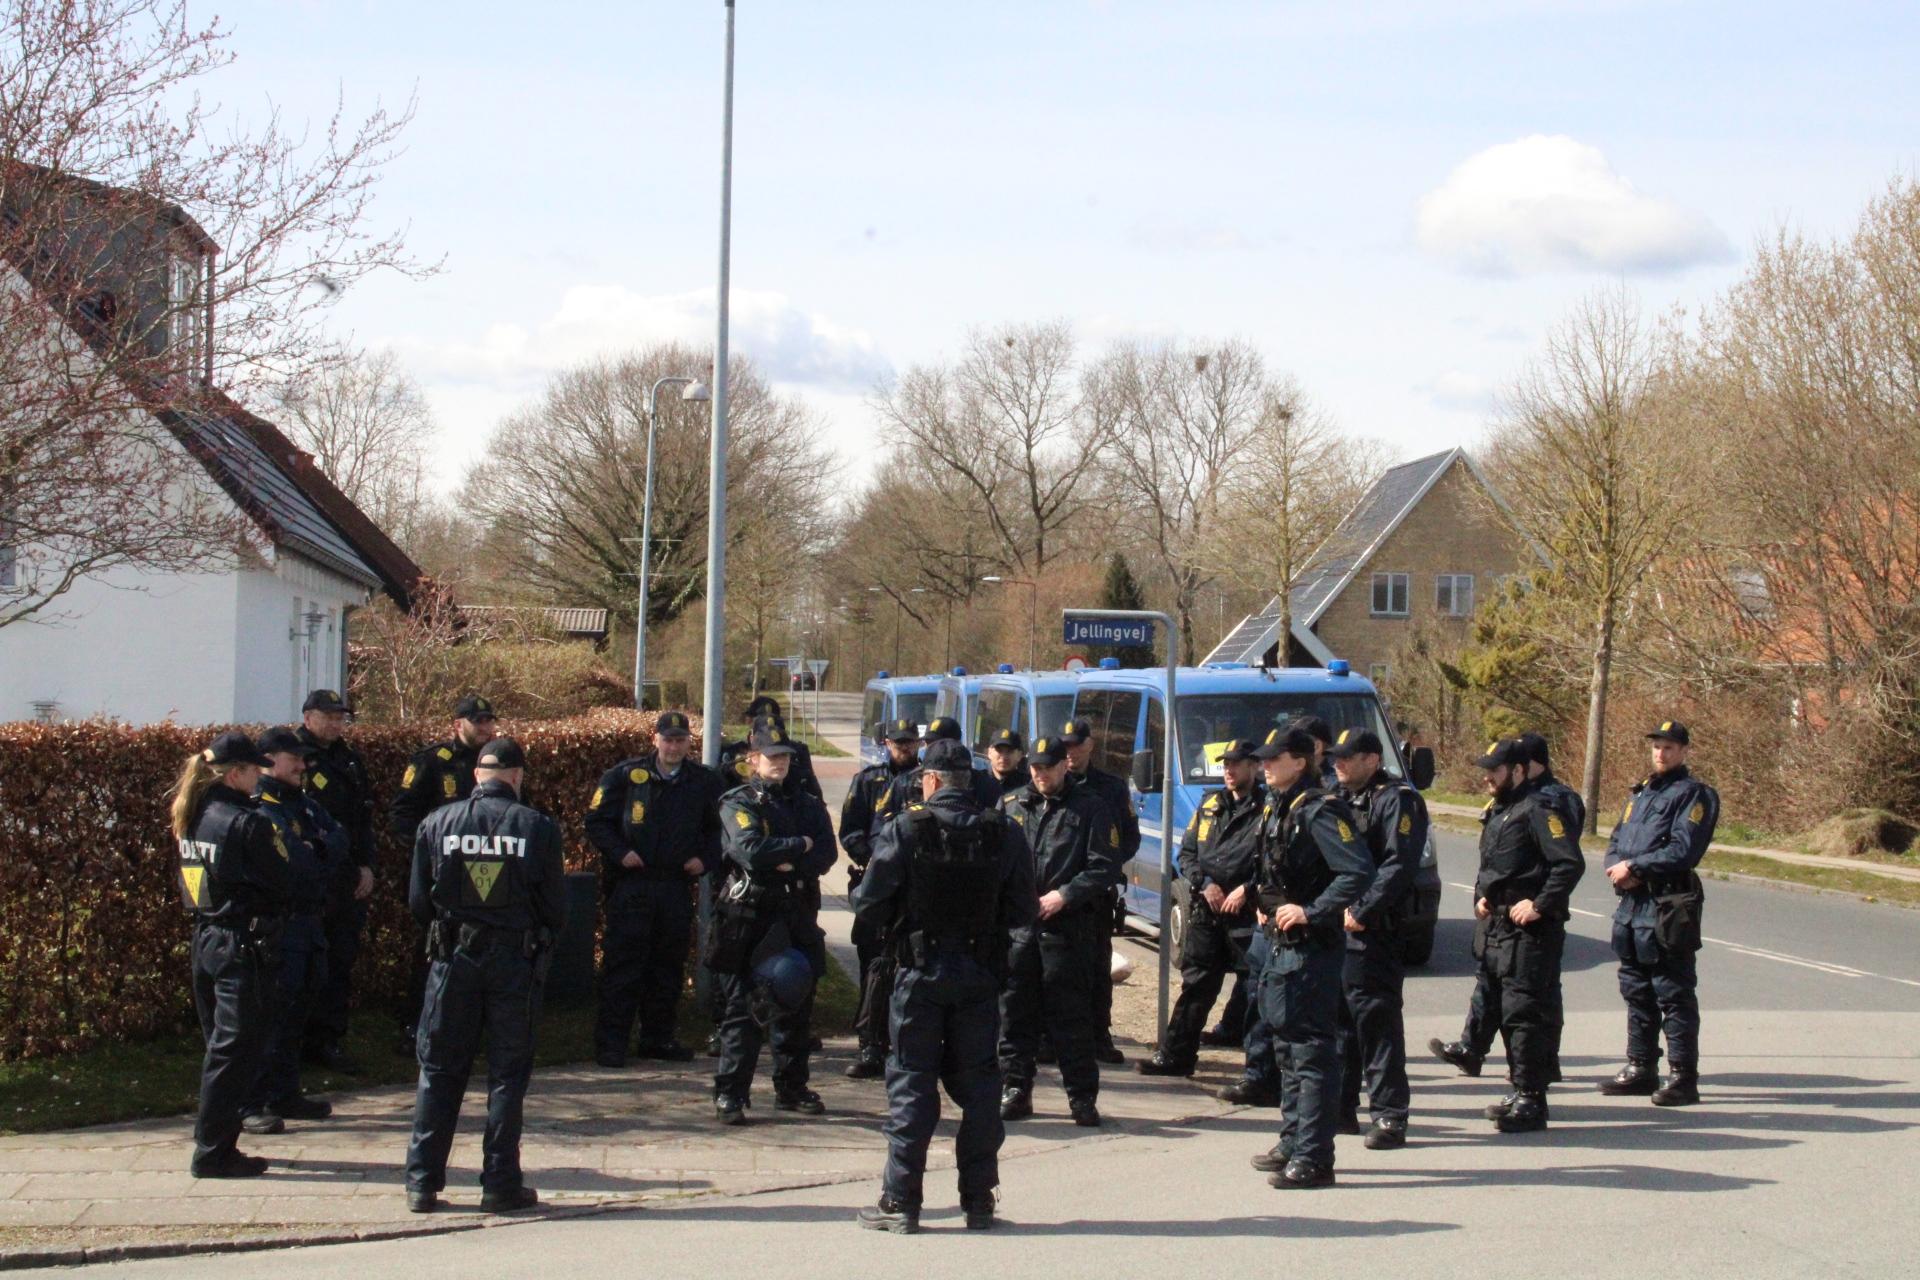 Stor politi-øvelse  i Odense